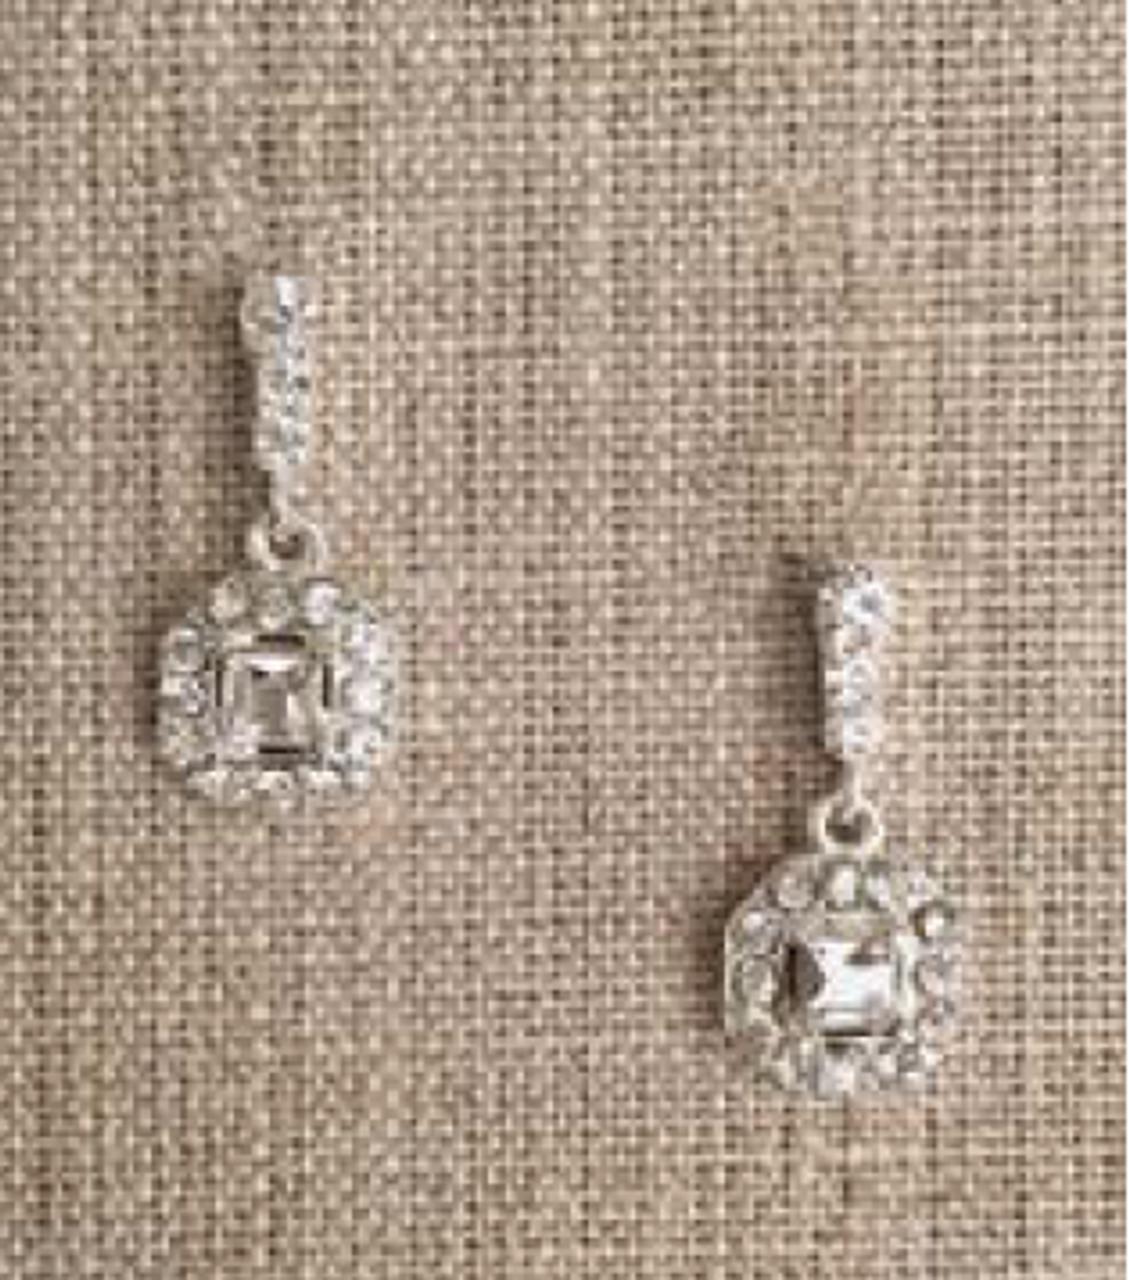 Bel Aire Bridal Earrings EA270 - Rhinestone drop earrings